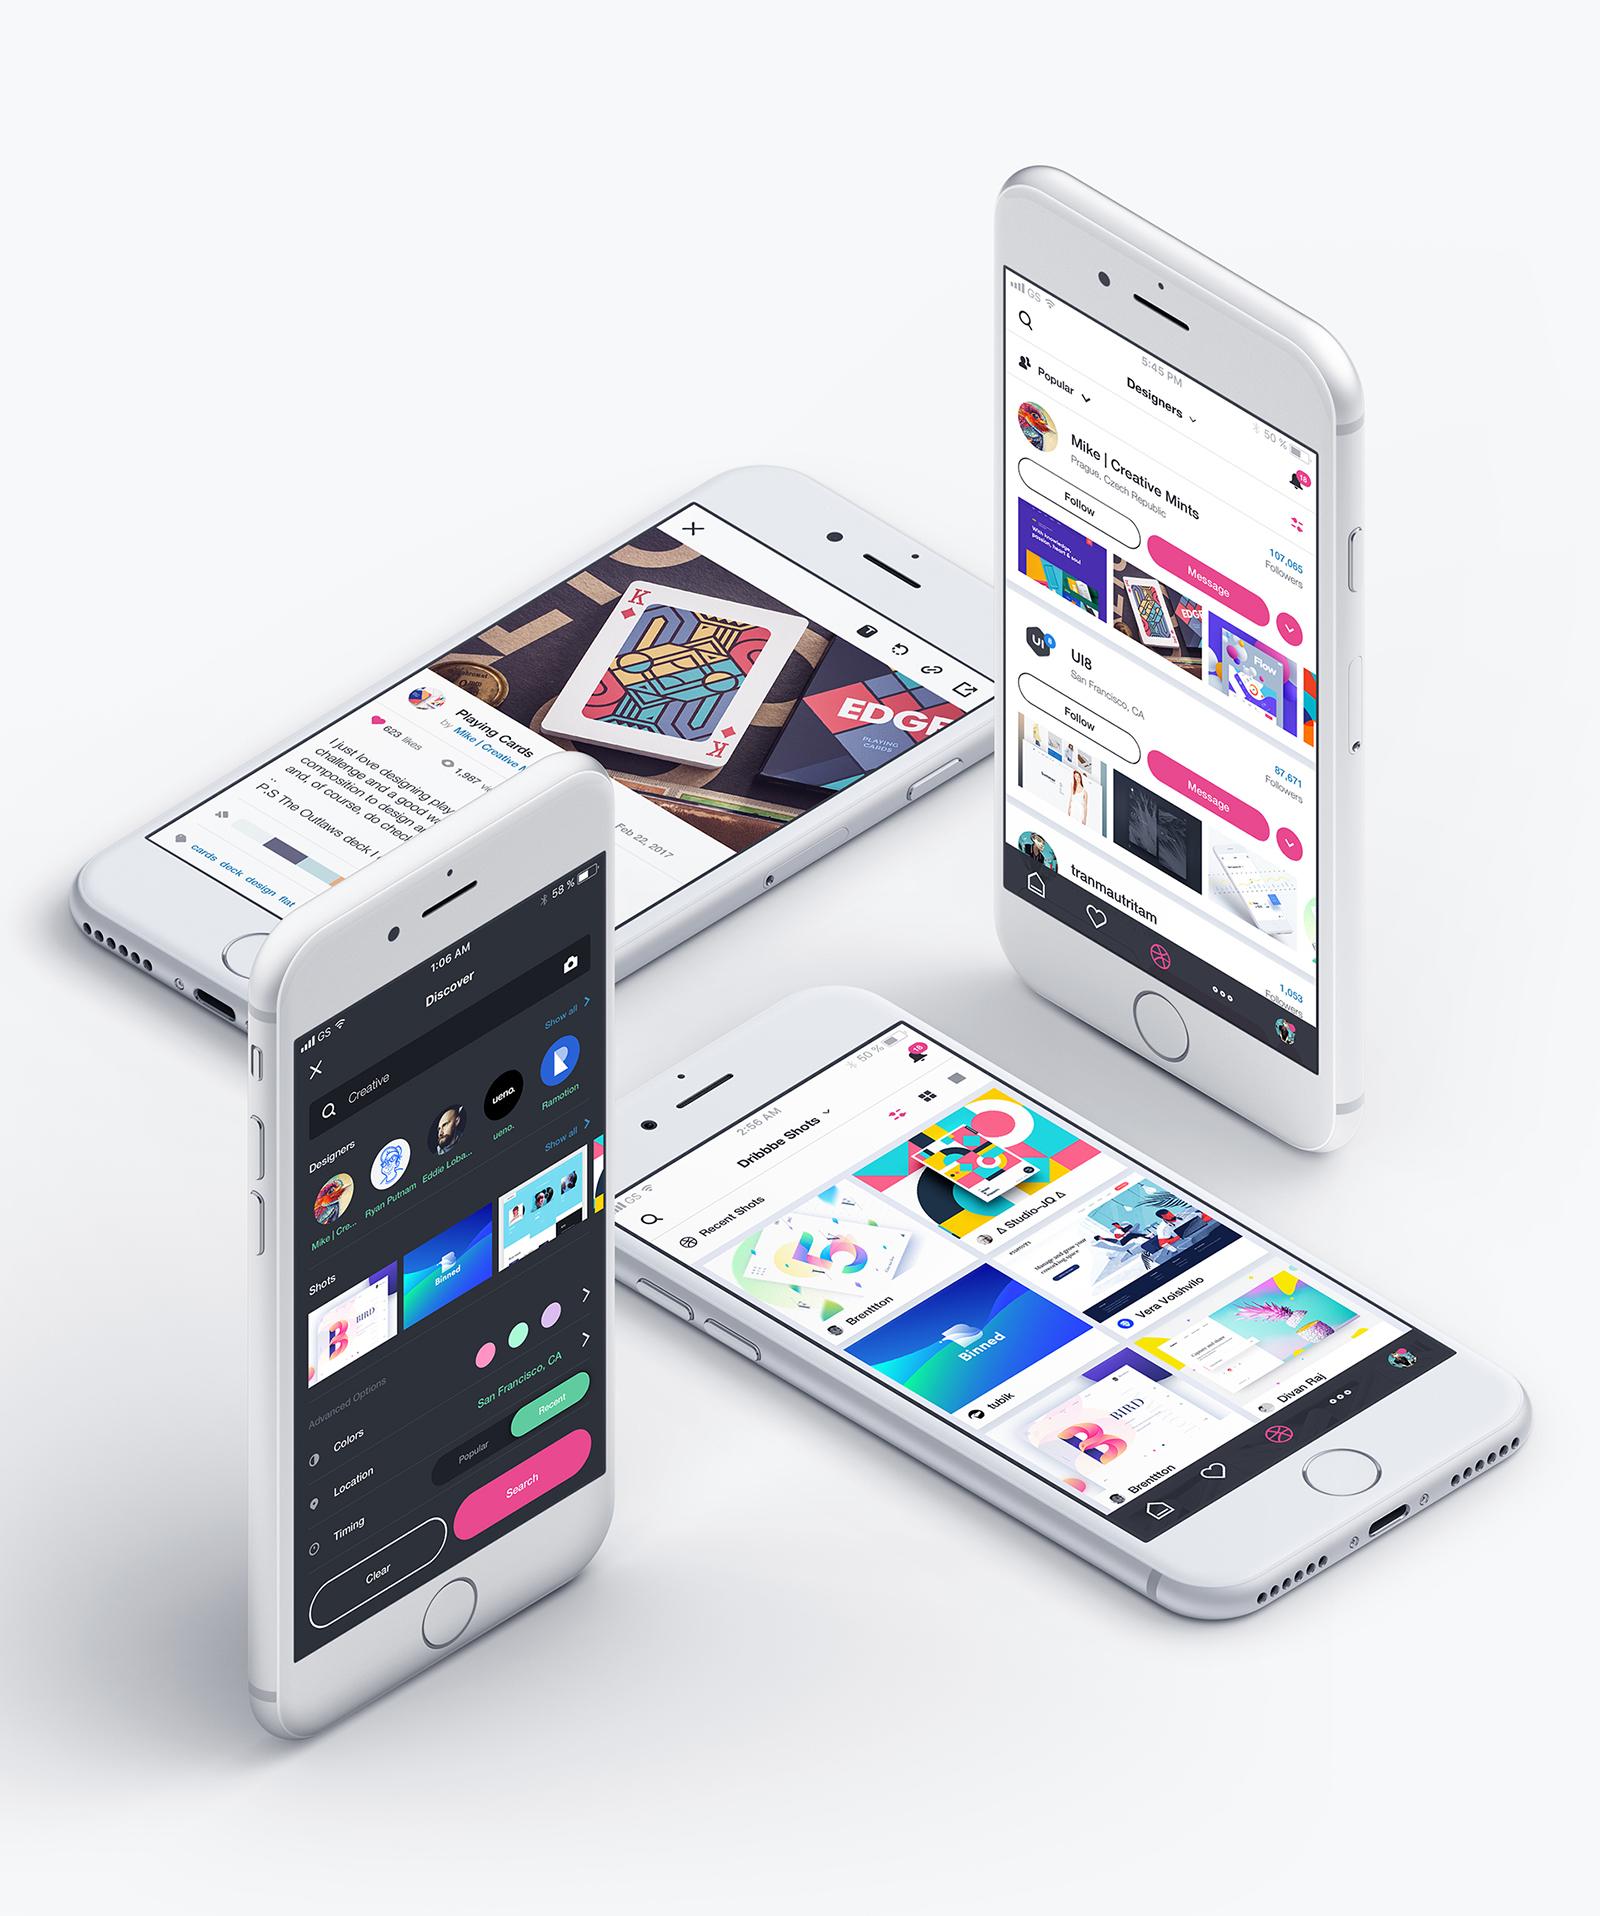 Interaction Design & iOS Design: Dribbble Redesign Concept